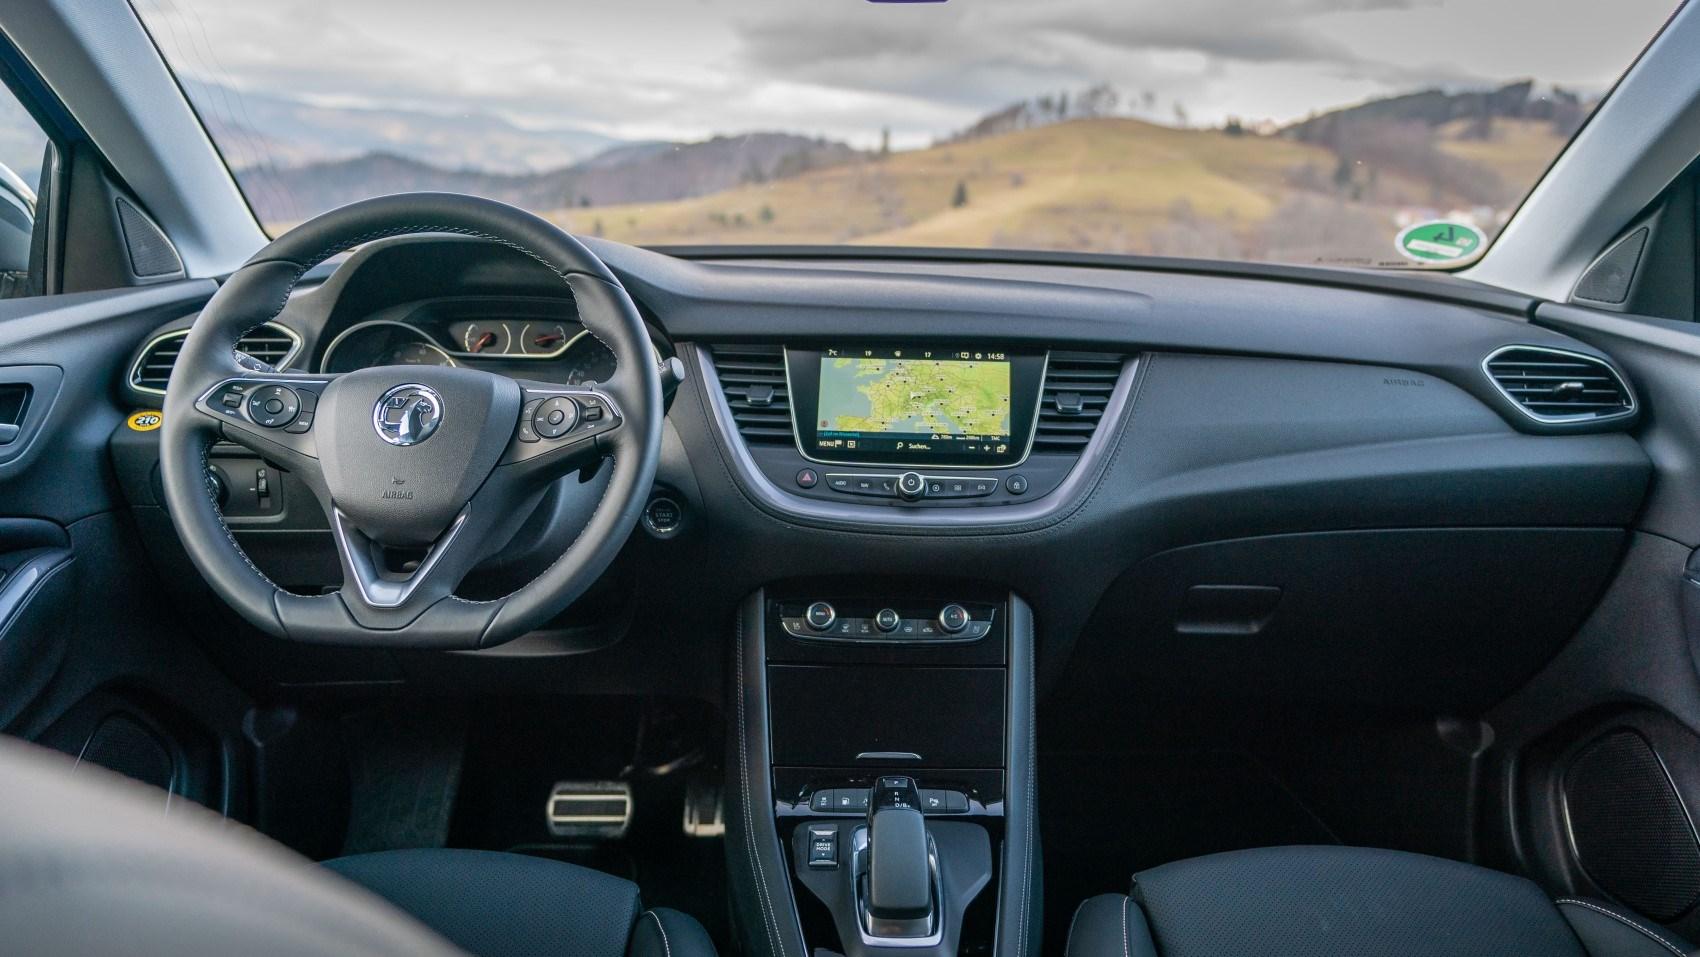 2020 Vauxhall Grandland X Hybrid4, interior